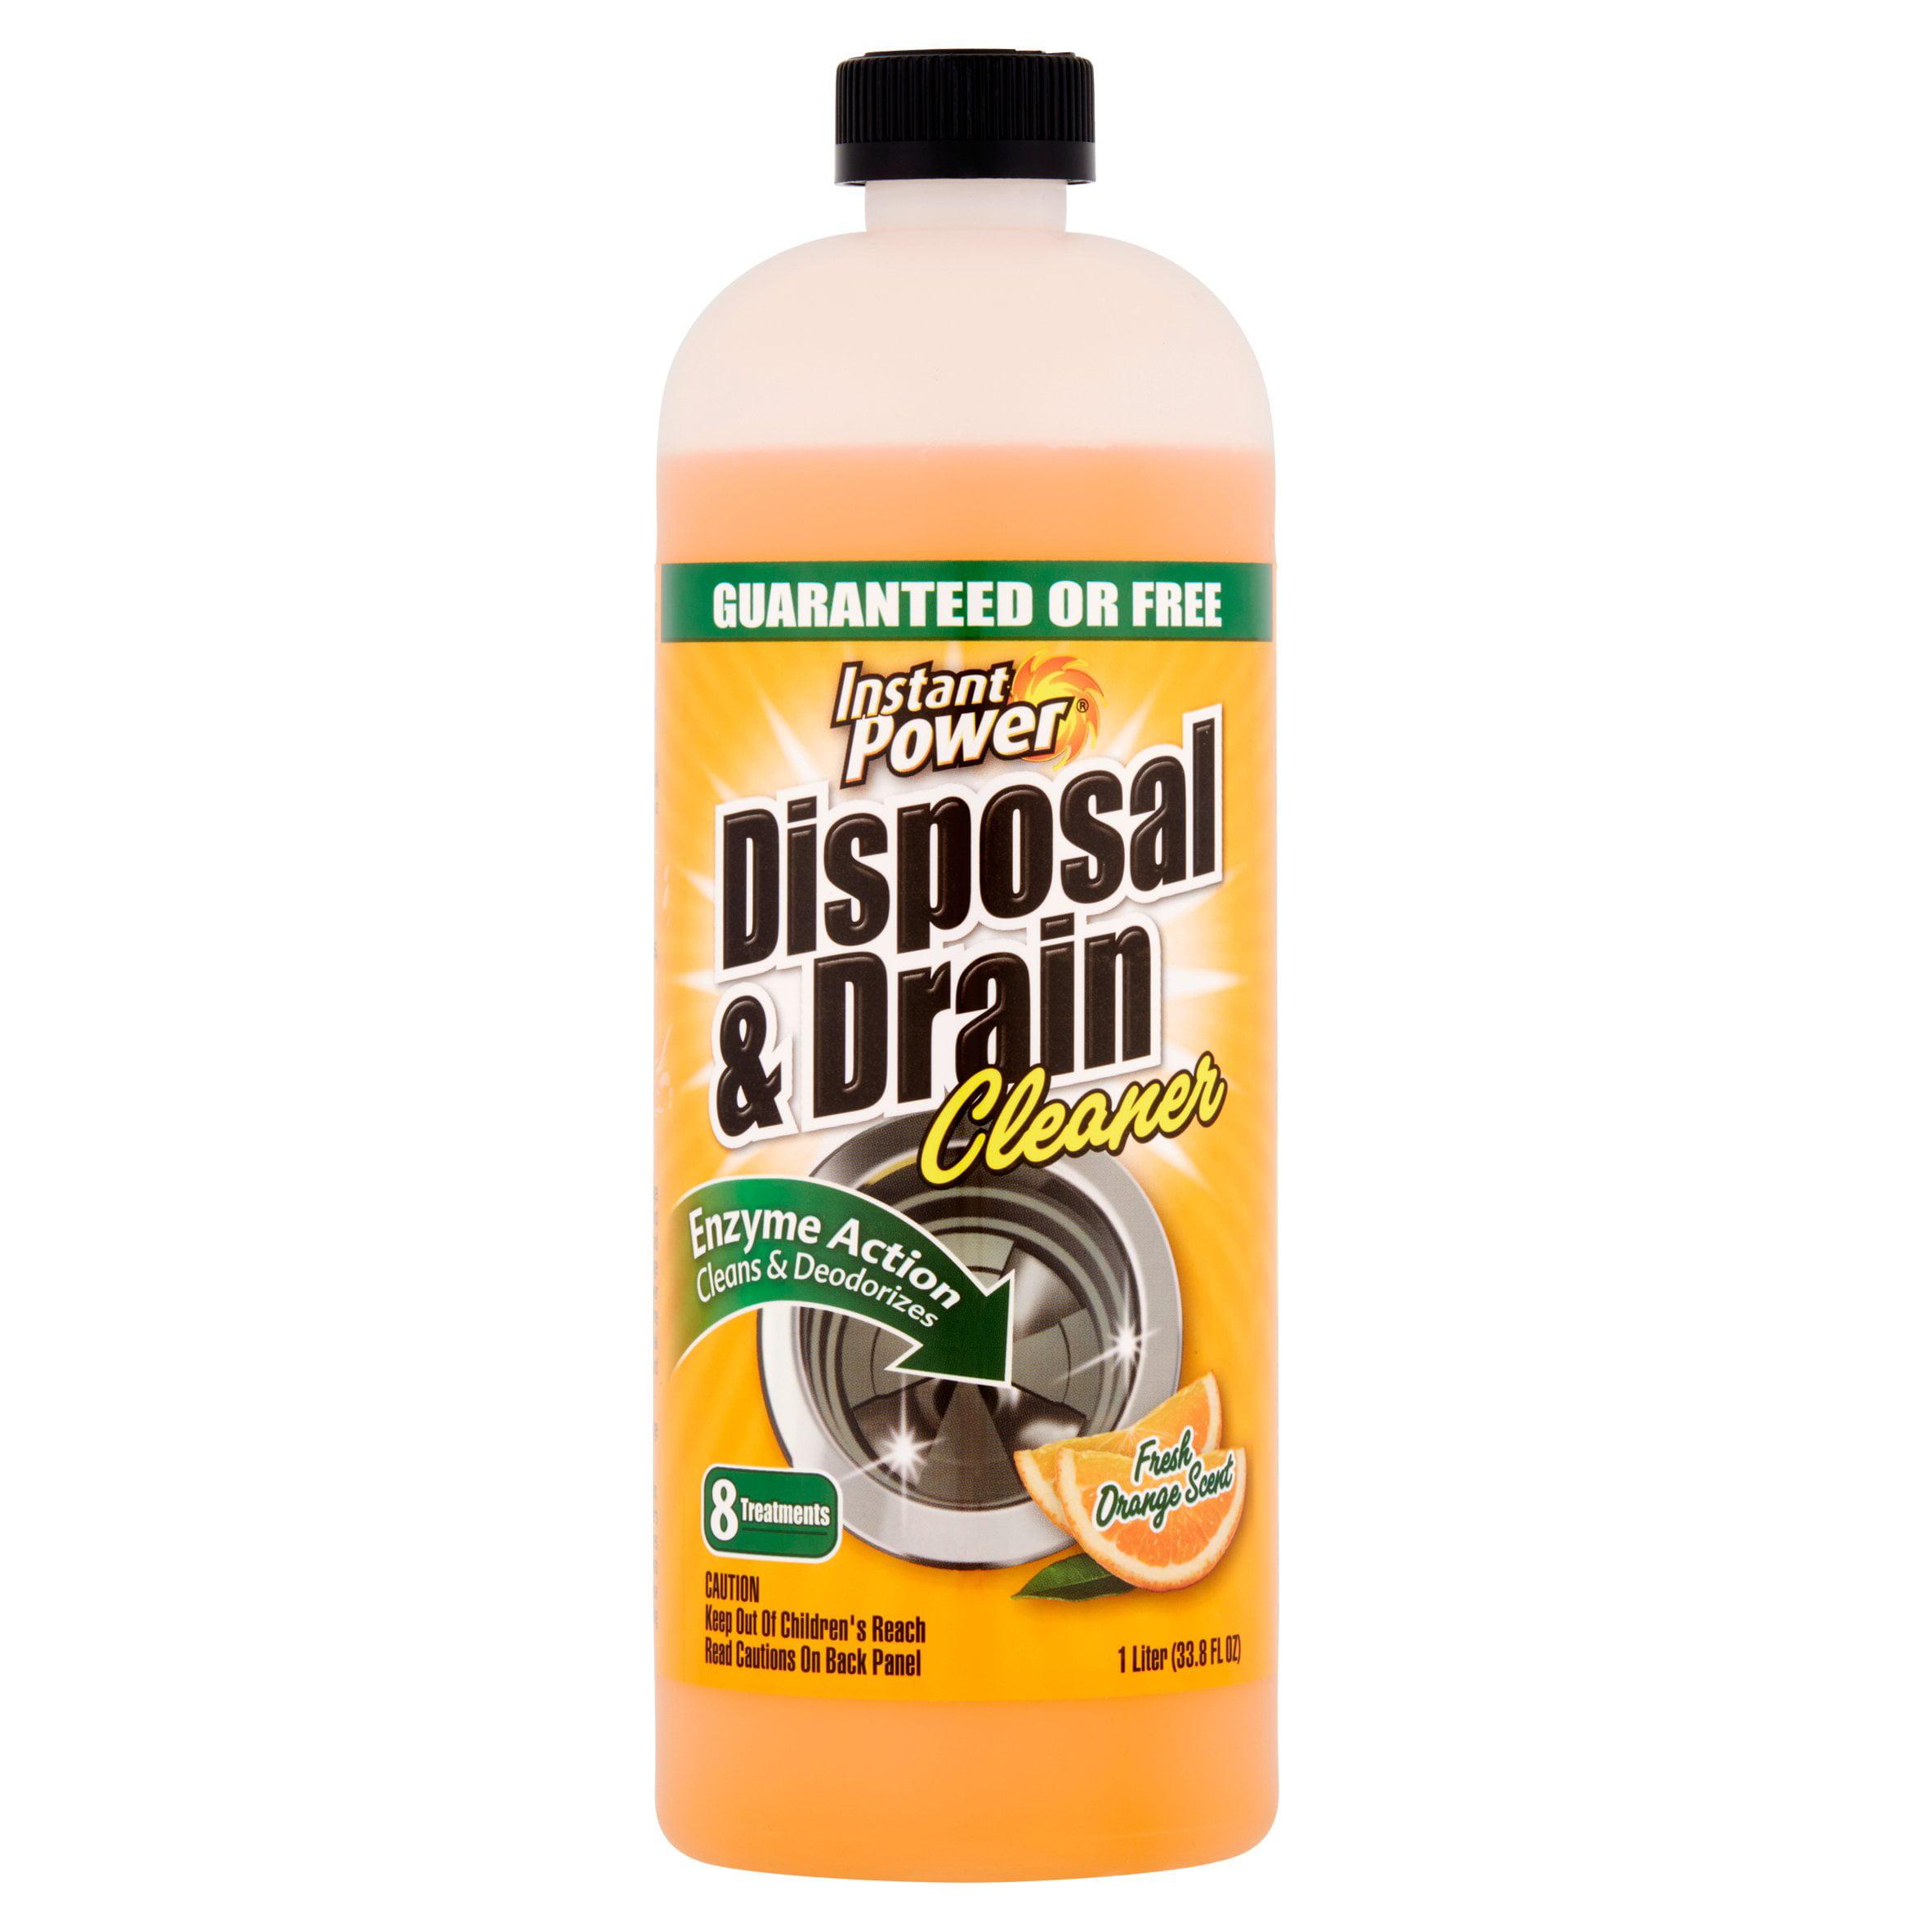 Instant Power Fresh Orange Scent Disposal & Drain Cleaner, 33.8 fl oz